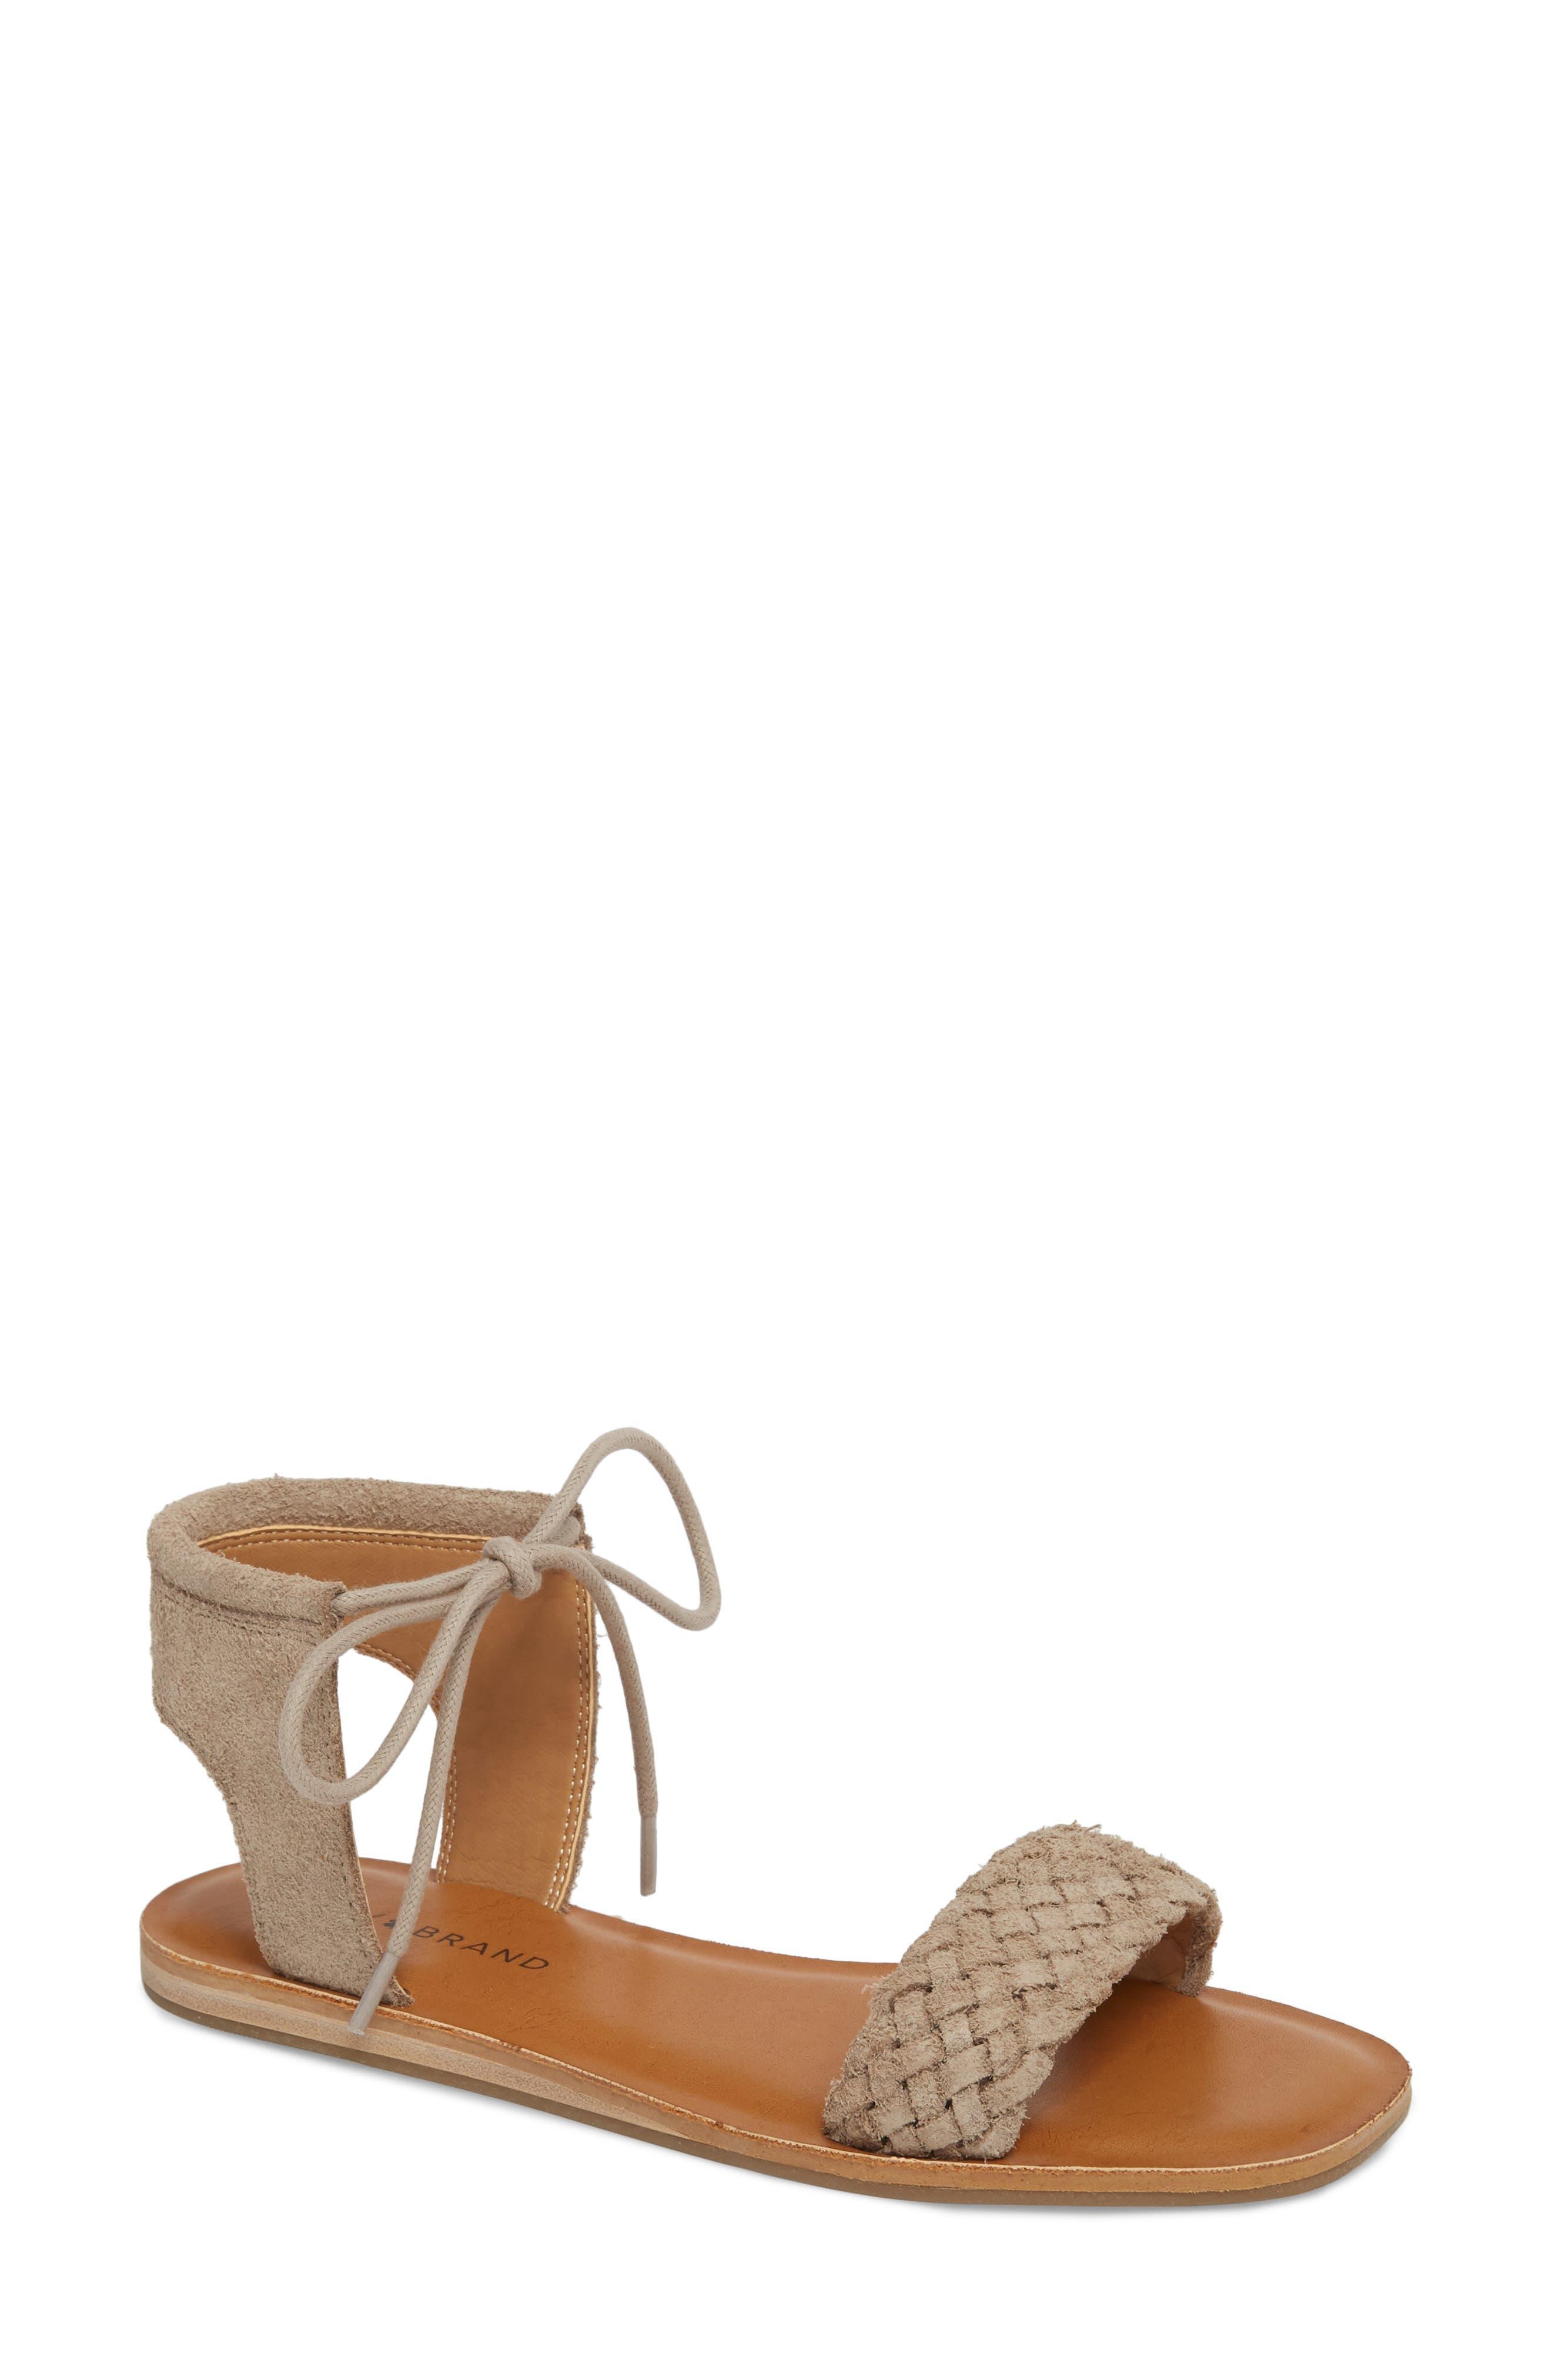 Lucky Brand Adannta Ankle Tie Sandal, Beige